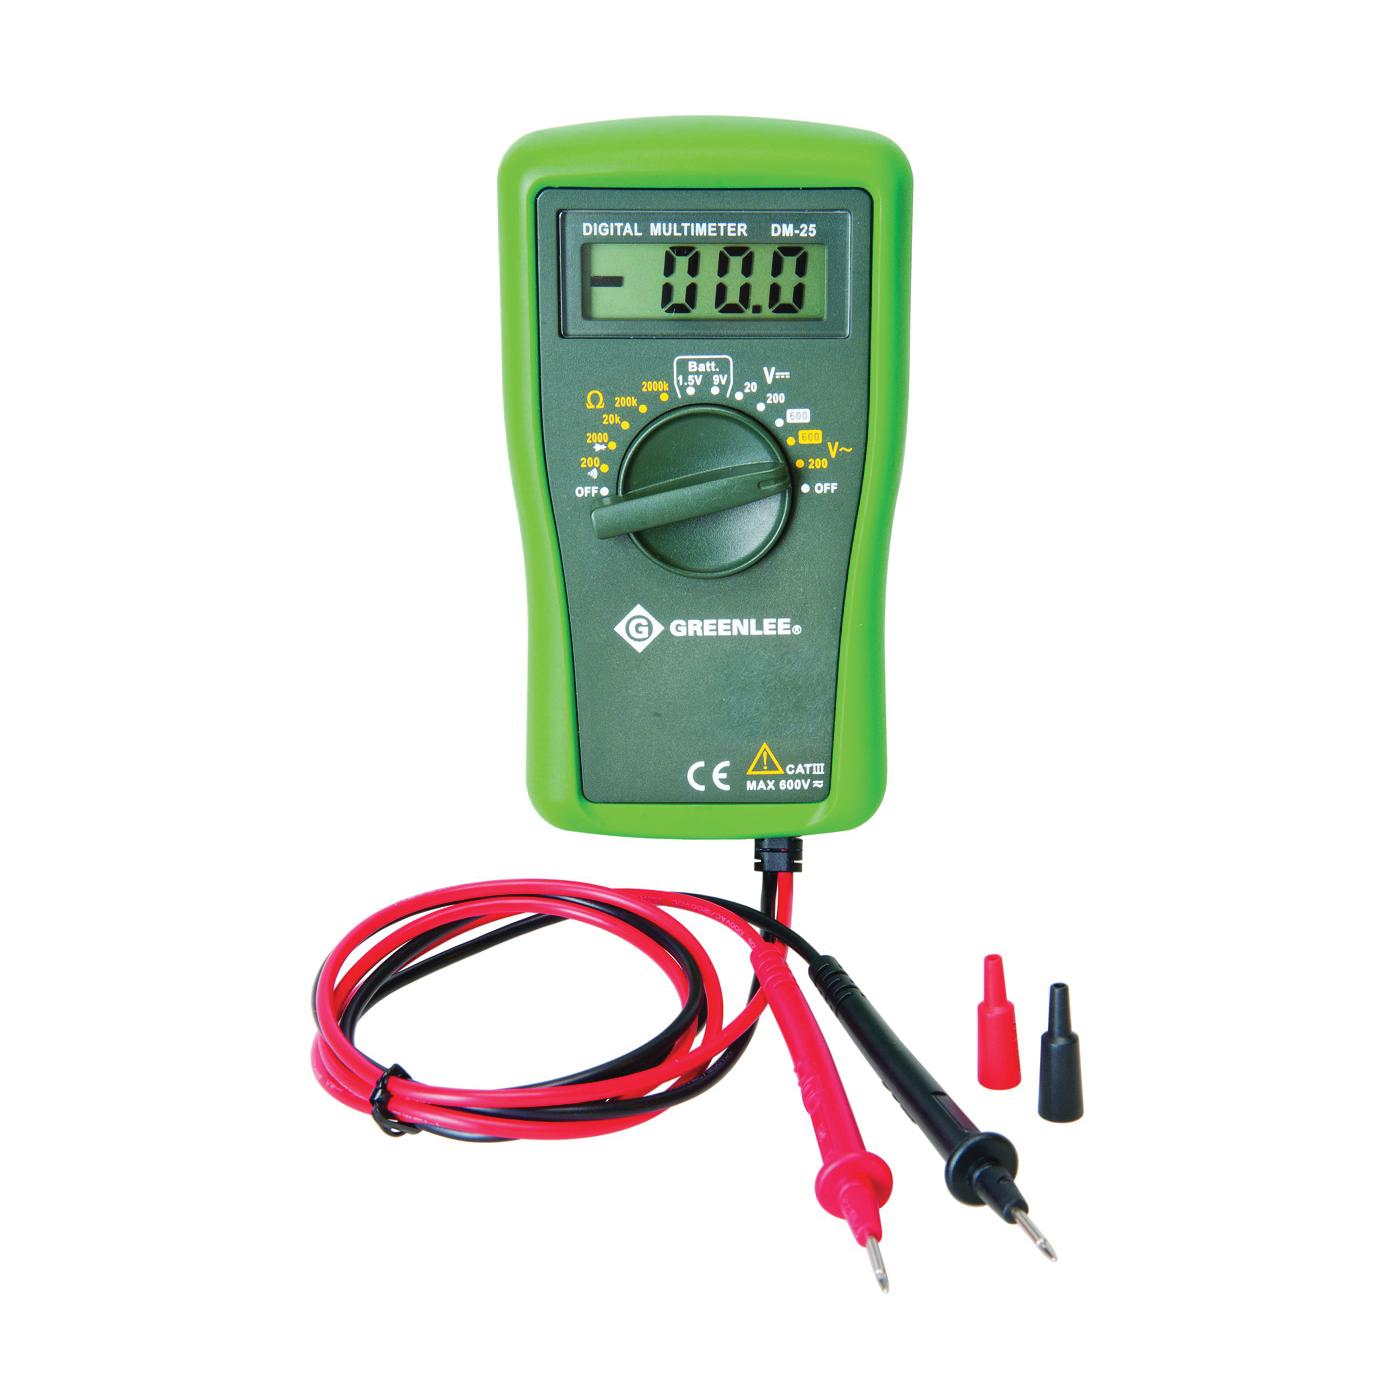 Picture of Greenlee DM-25 Digital Multimeter, Digital Display, Functions: AC Voltage, DC Voltage, Resistance